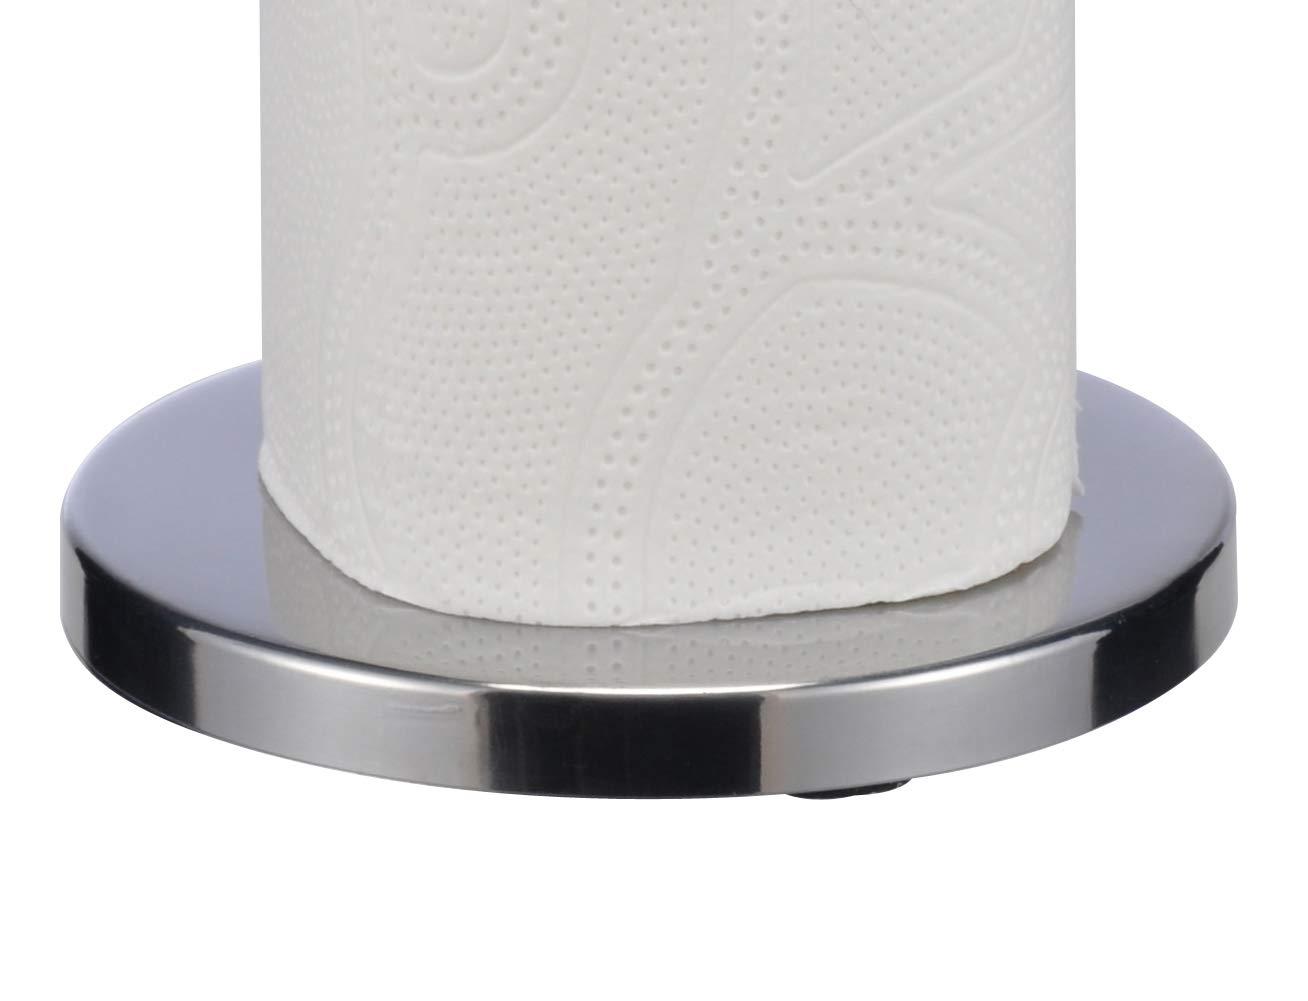 42 x 14,5 cm. Bambelaa Soporte para Rollos de Papel higi/énico de Aprox